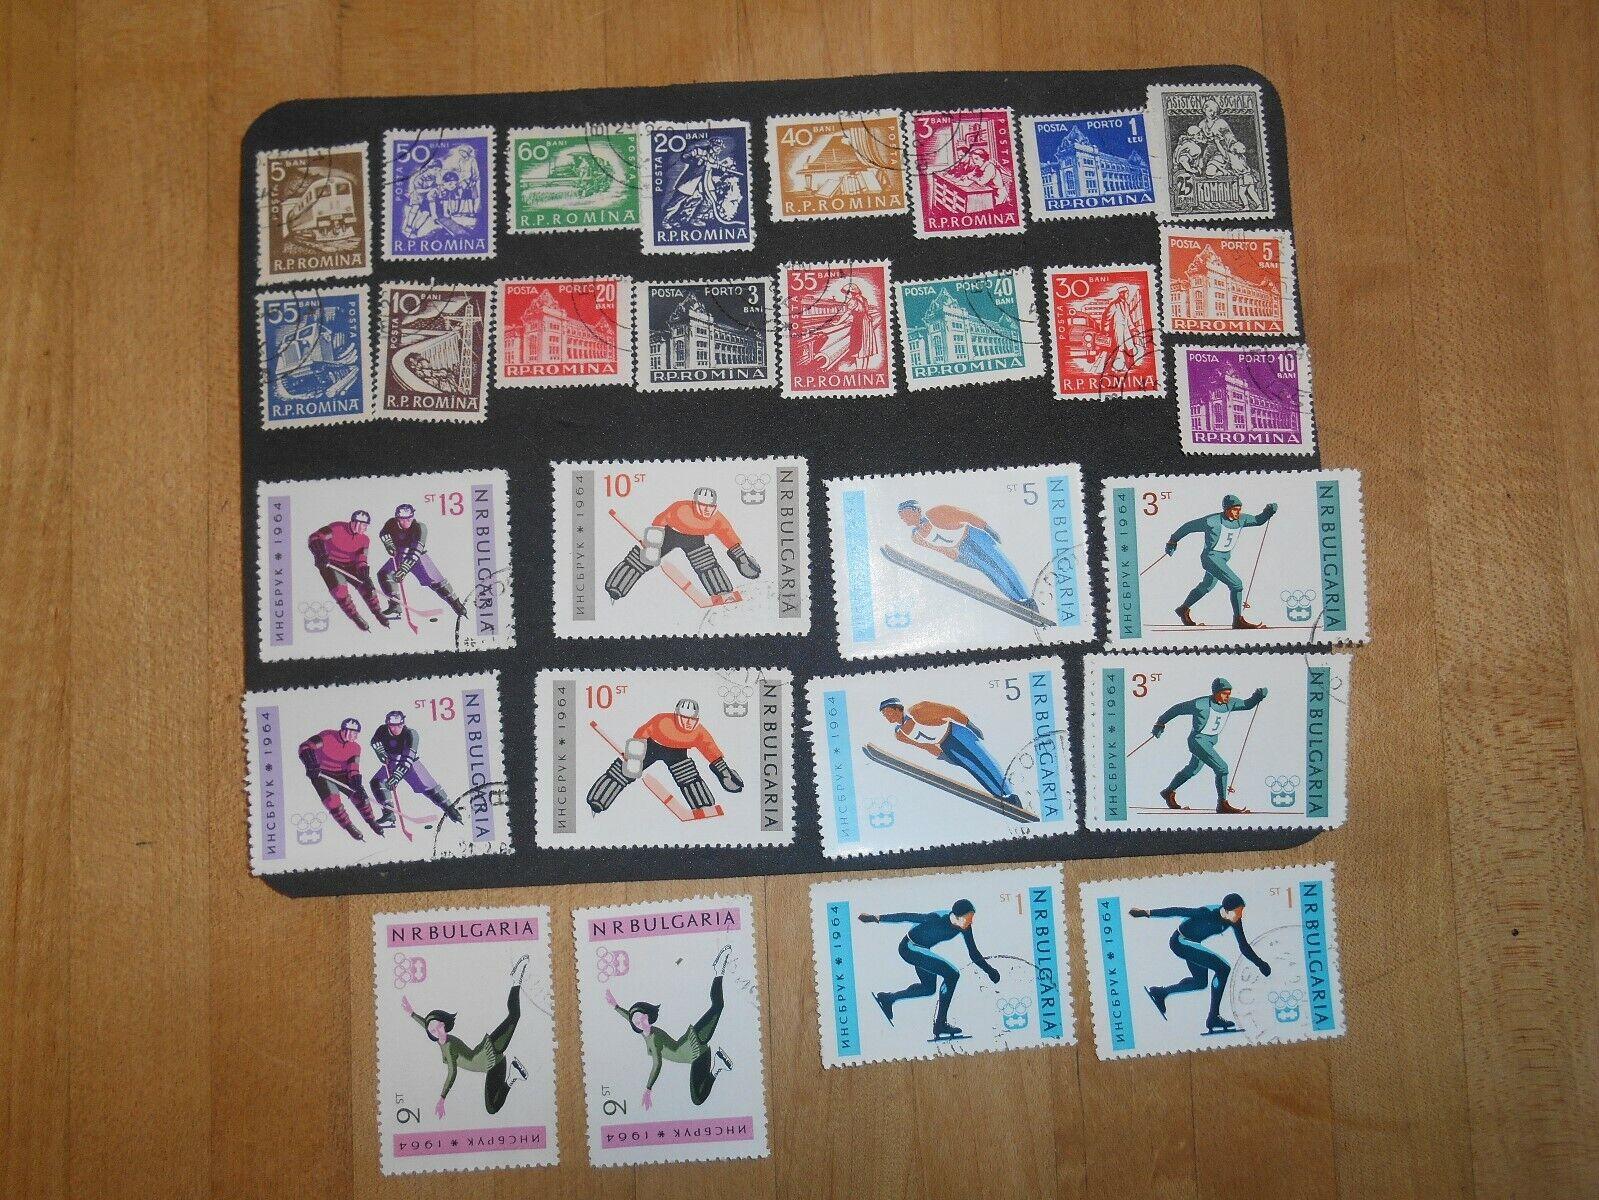 Romania Postage Stamp 25 Bani 1044MLH Romania Used Stamps. Bulgaria Olympics. - $3.50